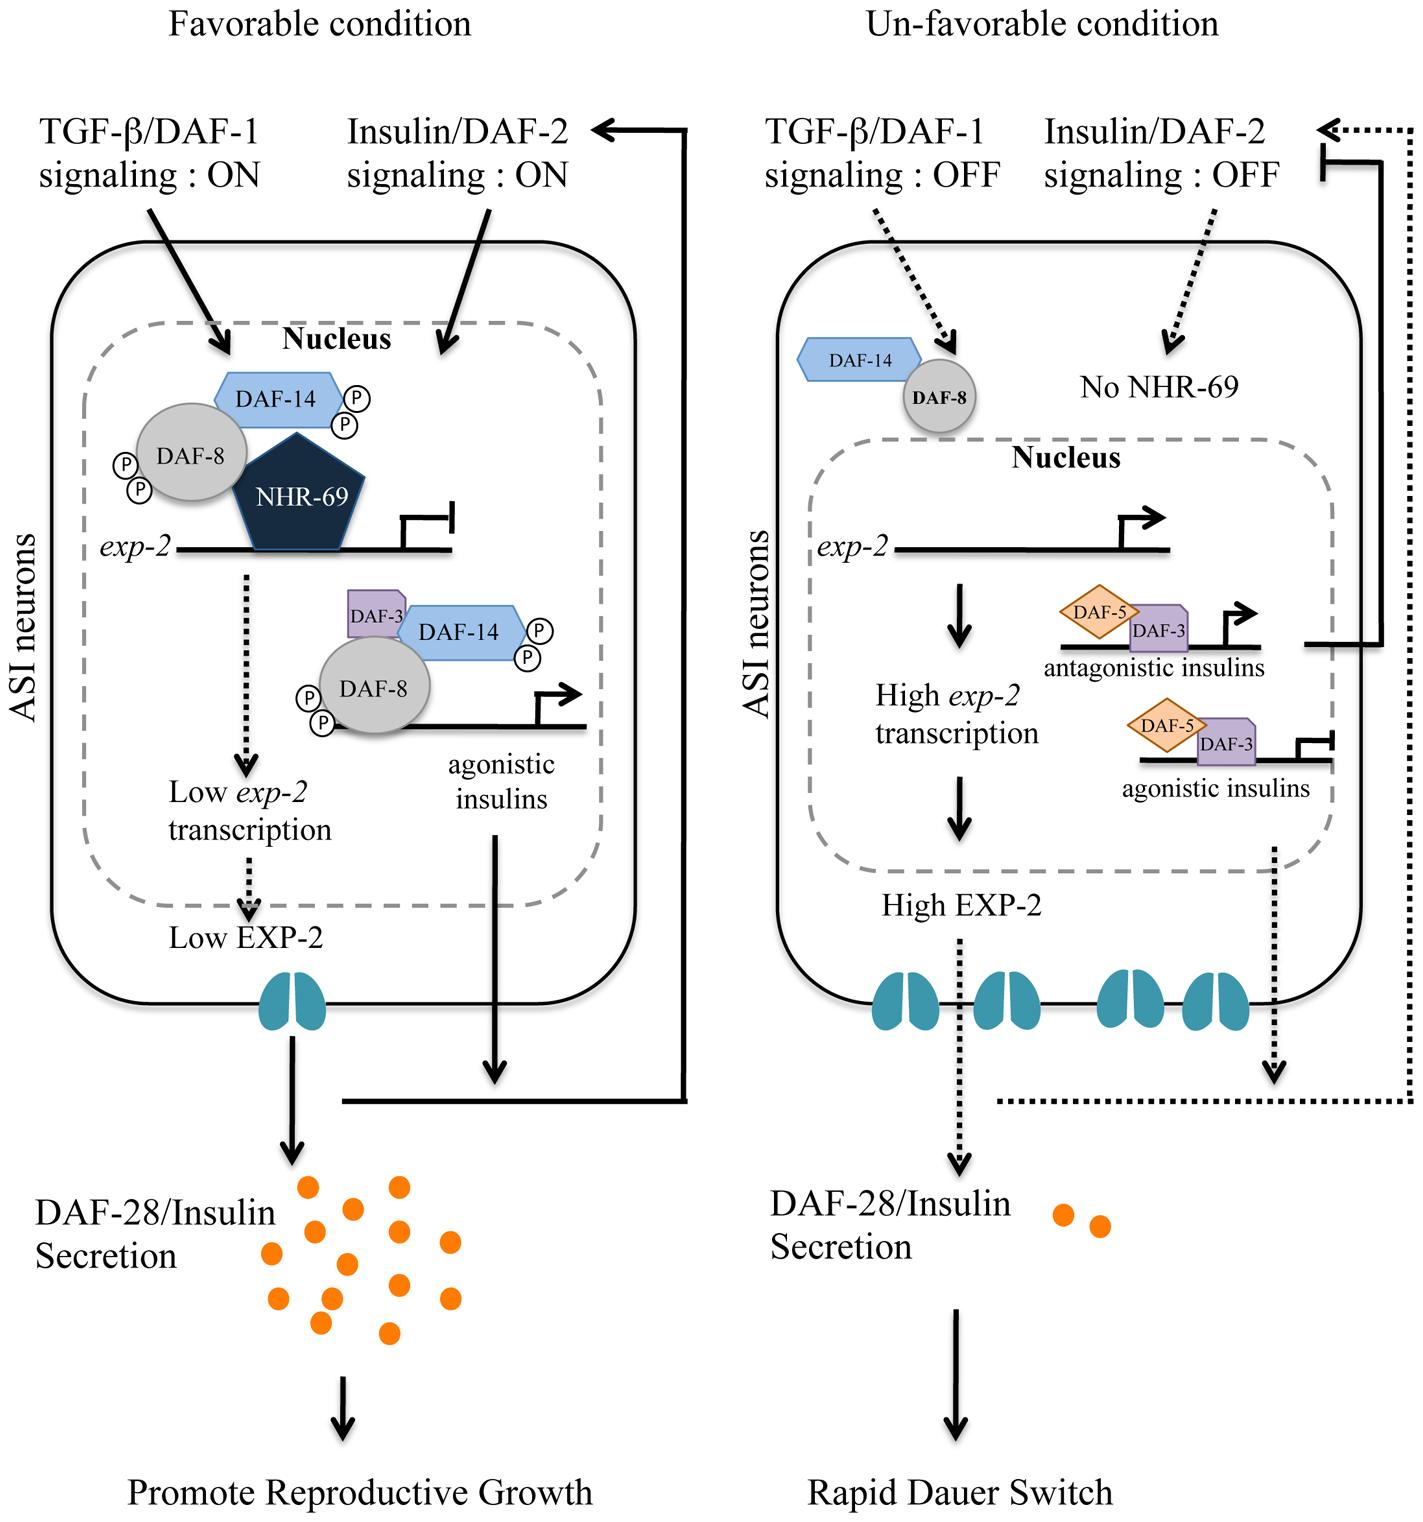 Working model for DAF-8 and NHR-69 modulation of insulin secretion in <i>C. elegans</i>.